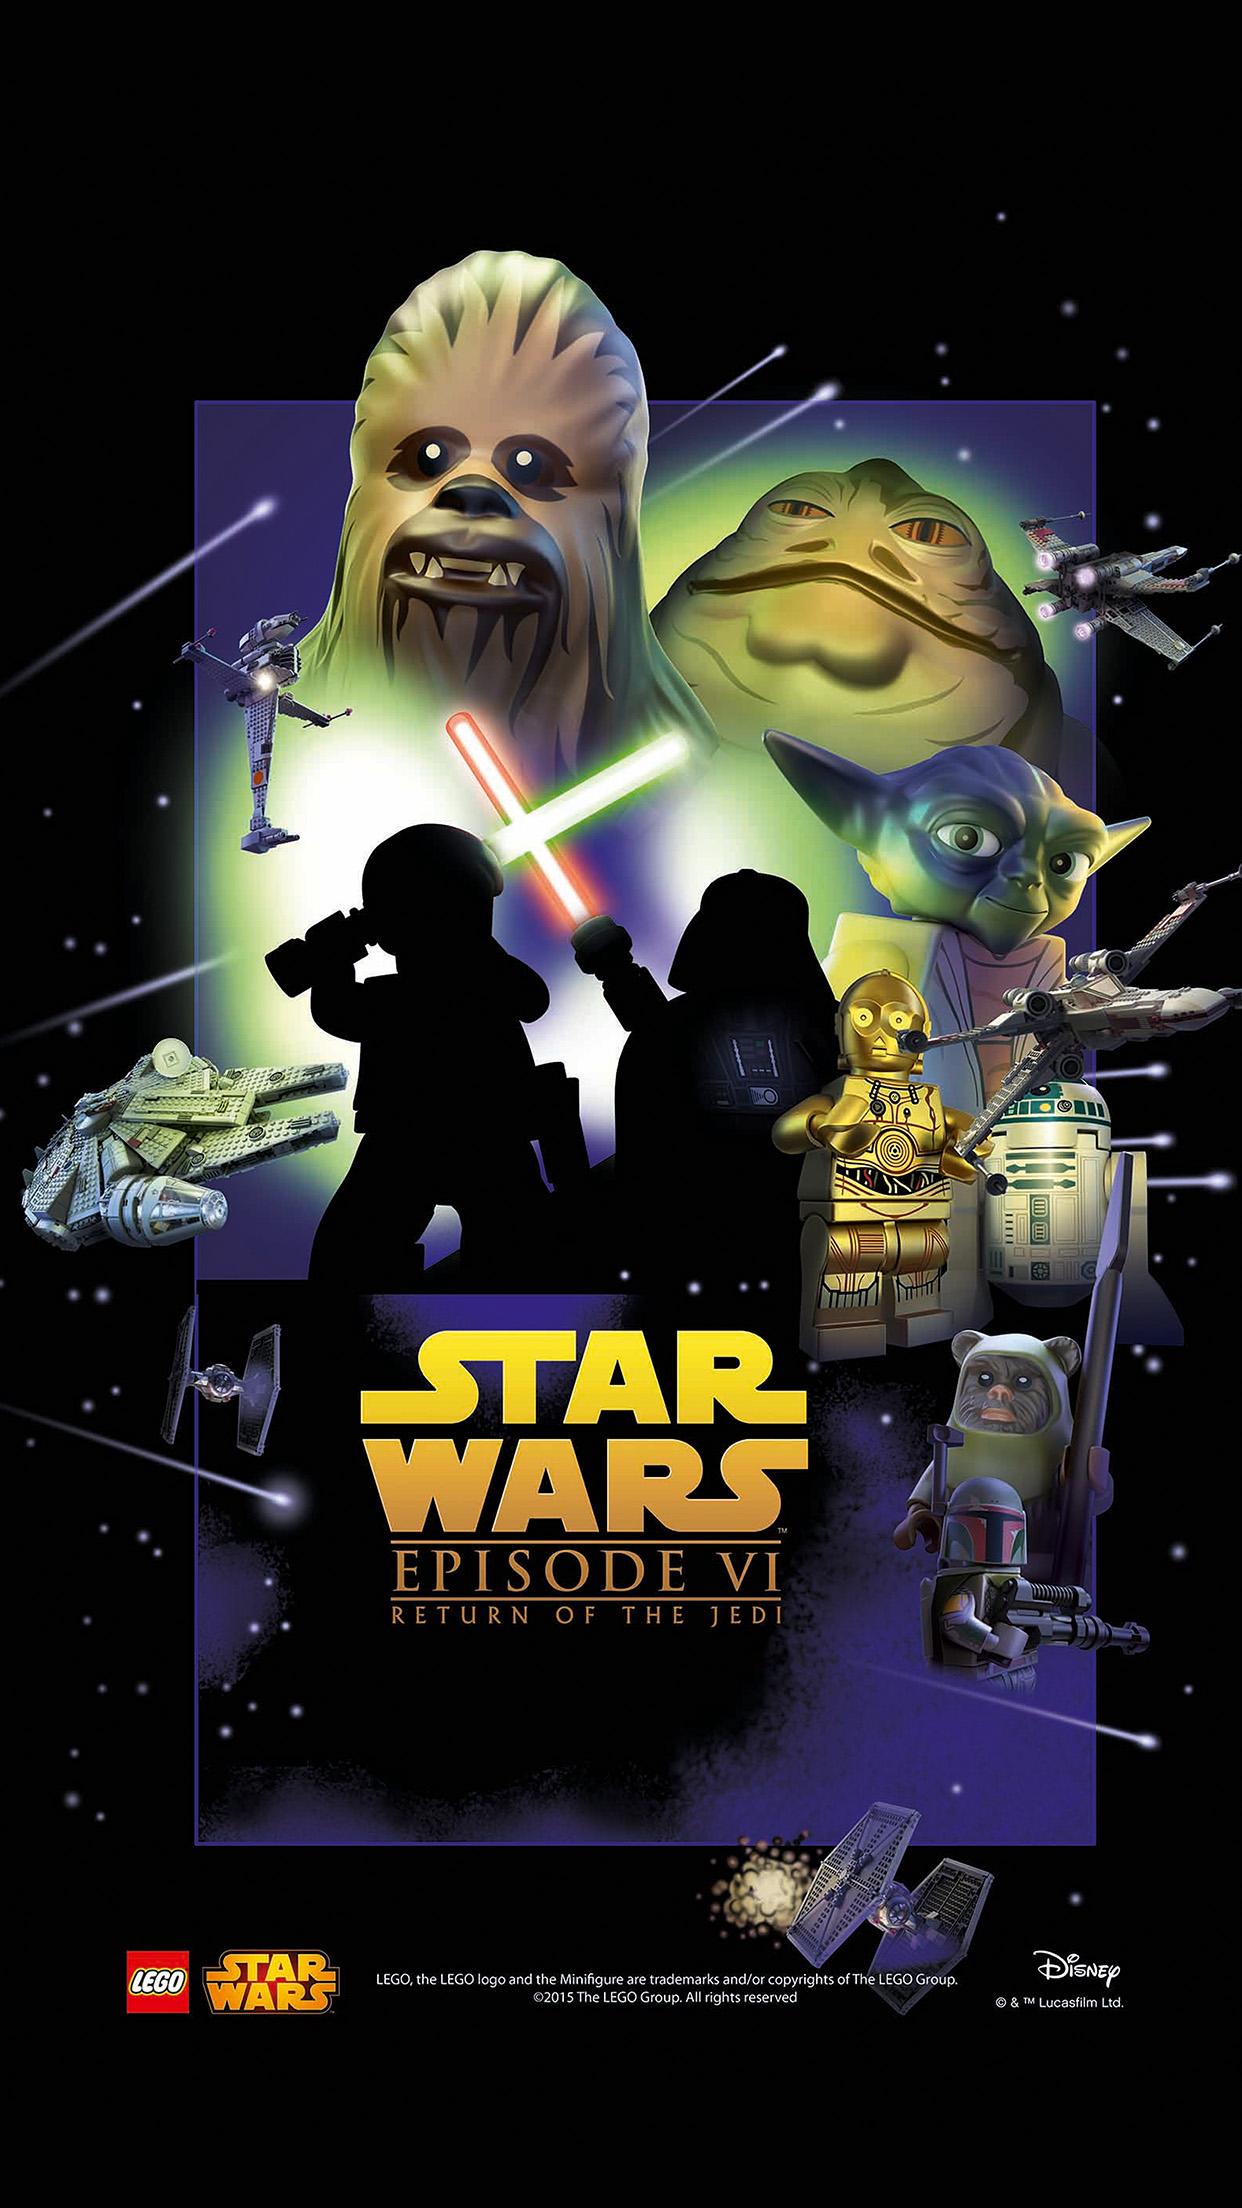 Papers Co Iphone Wallpaper Ap26 Starwars Lego Episode 6 Return Of Jedi Art Film